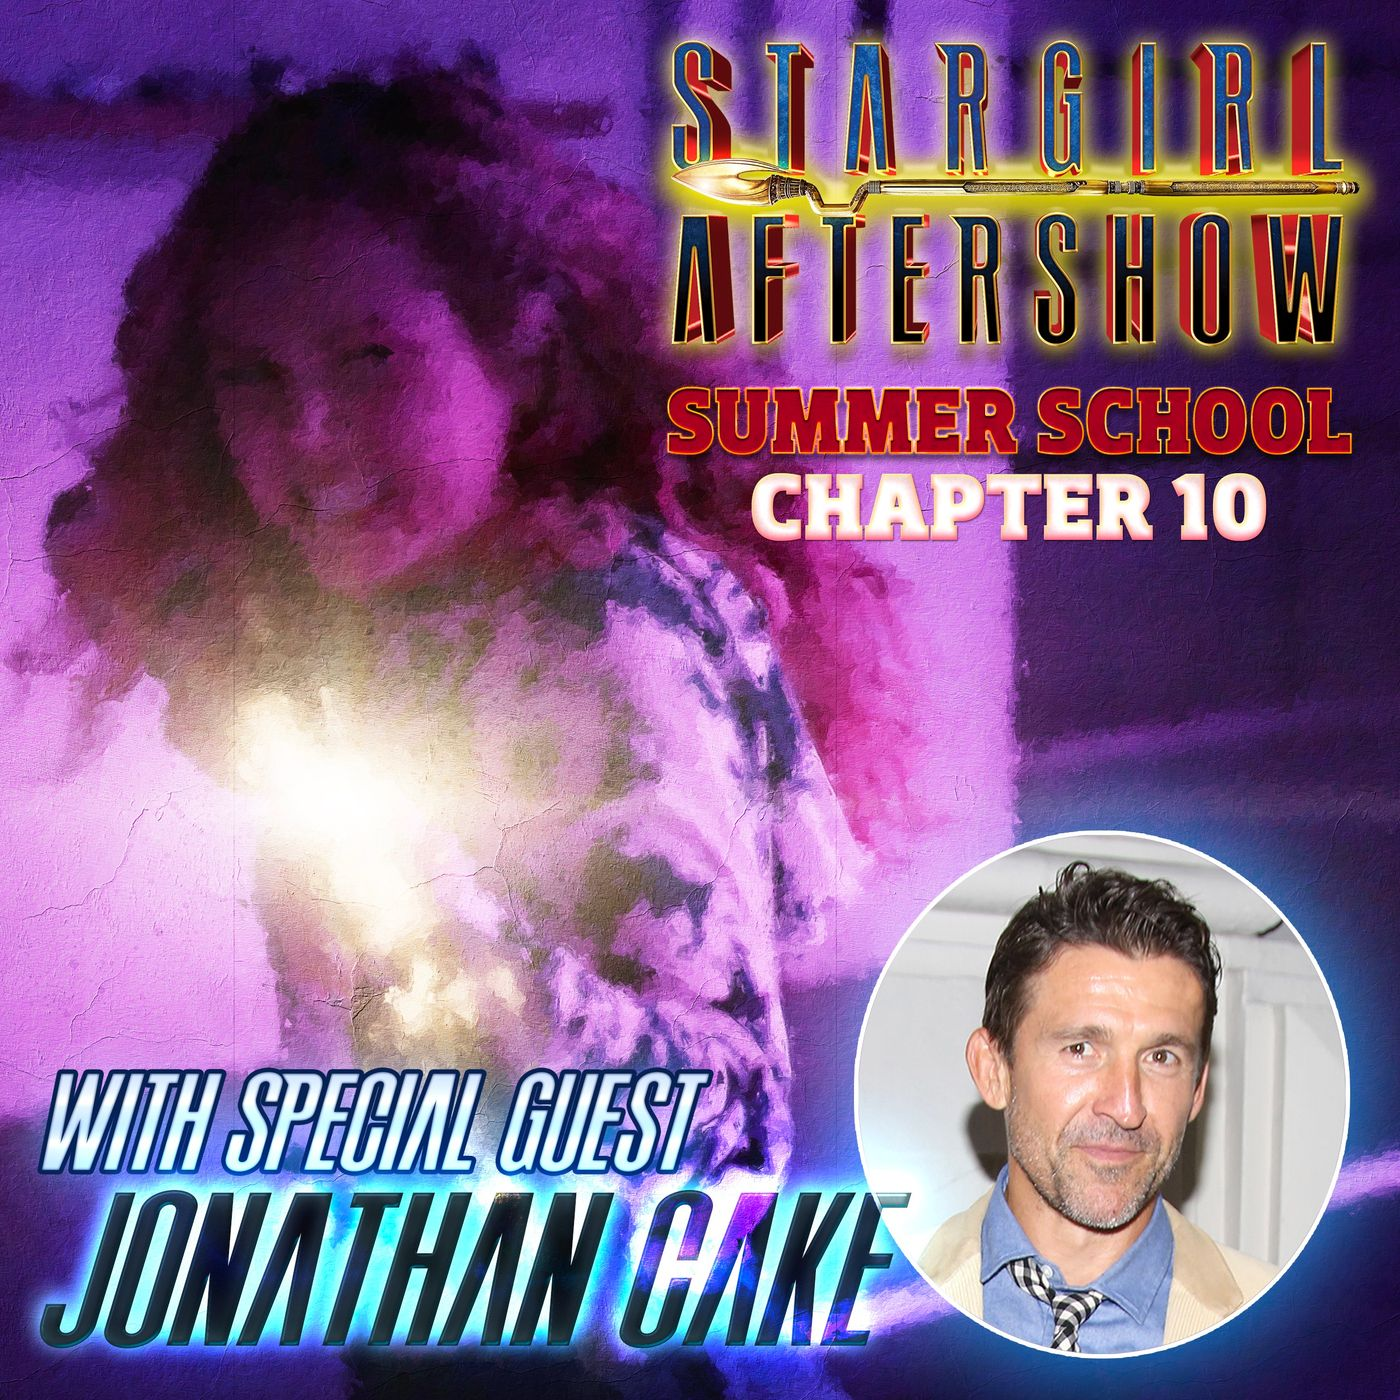 STARGIRL 210 w/ Jonathan Cake